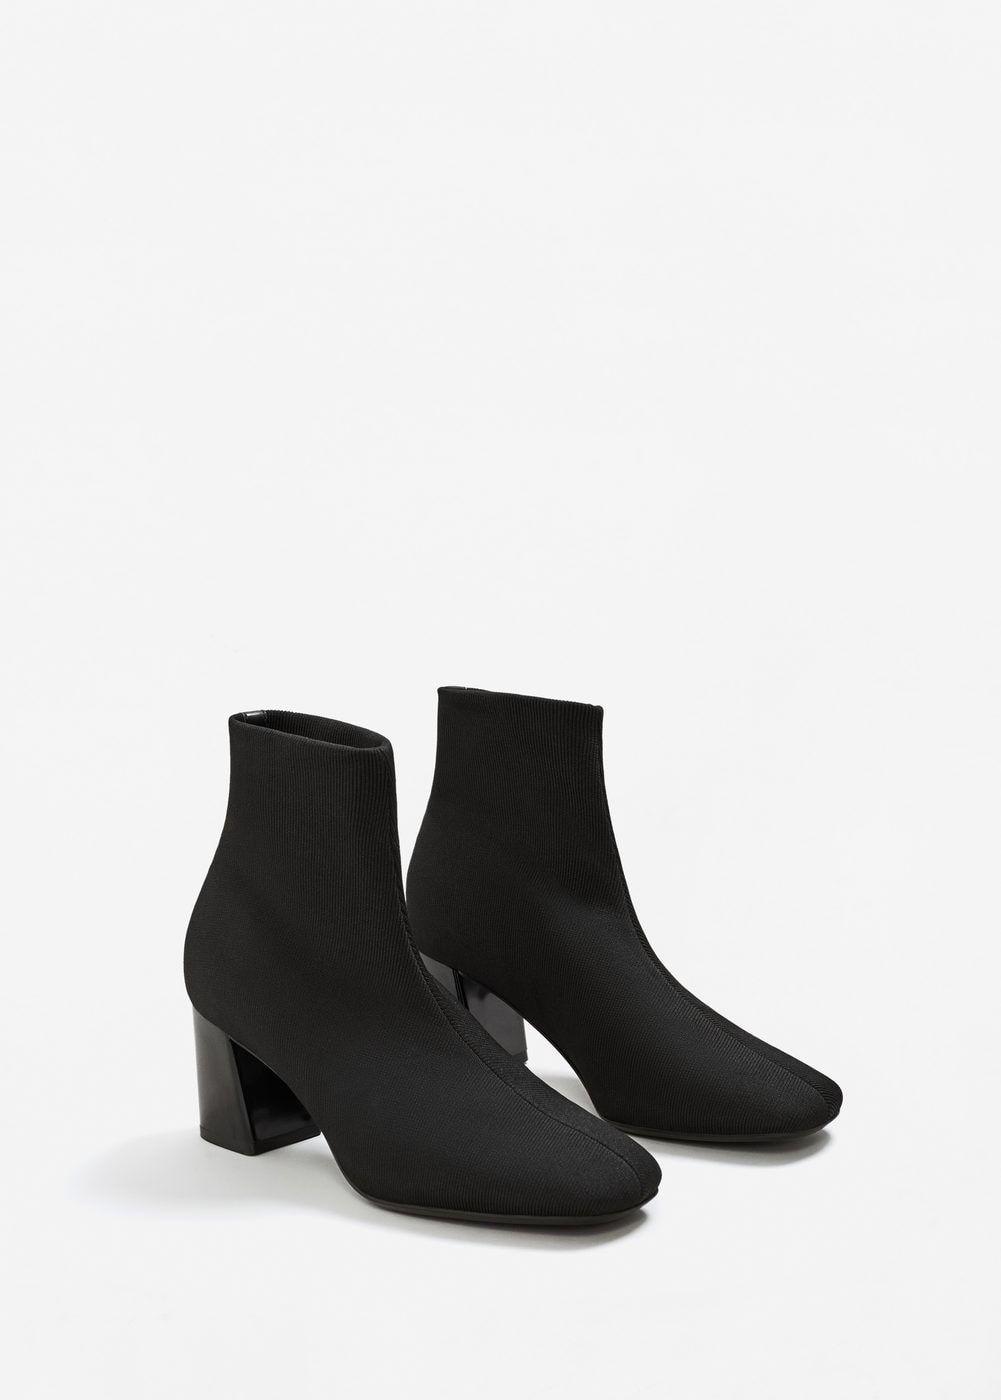 58beaf9e00f2a7 Topuklu çorap bot - Pantolon - Kadın | MANGO Türkiye Bottines Chaussettes,  Chaussure, Femme